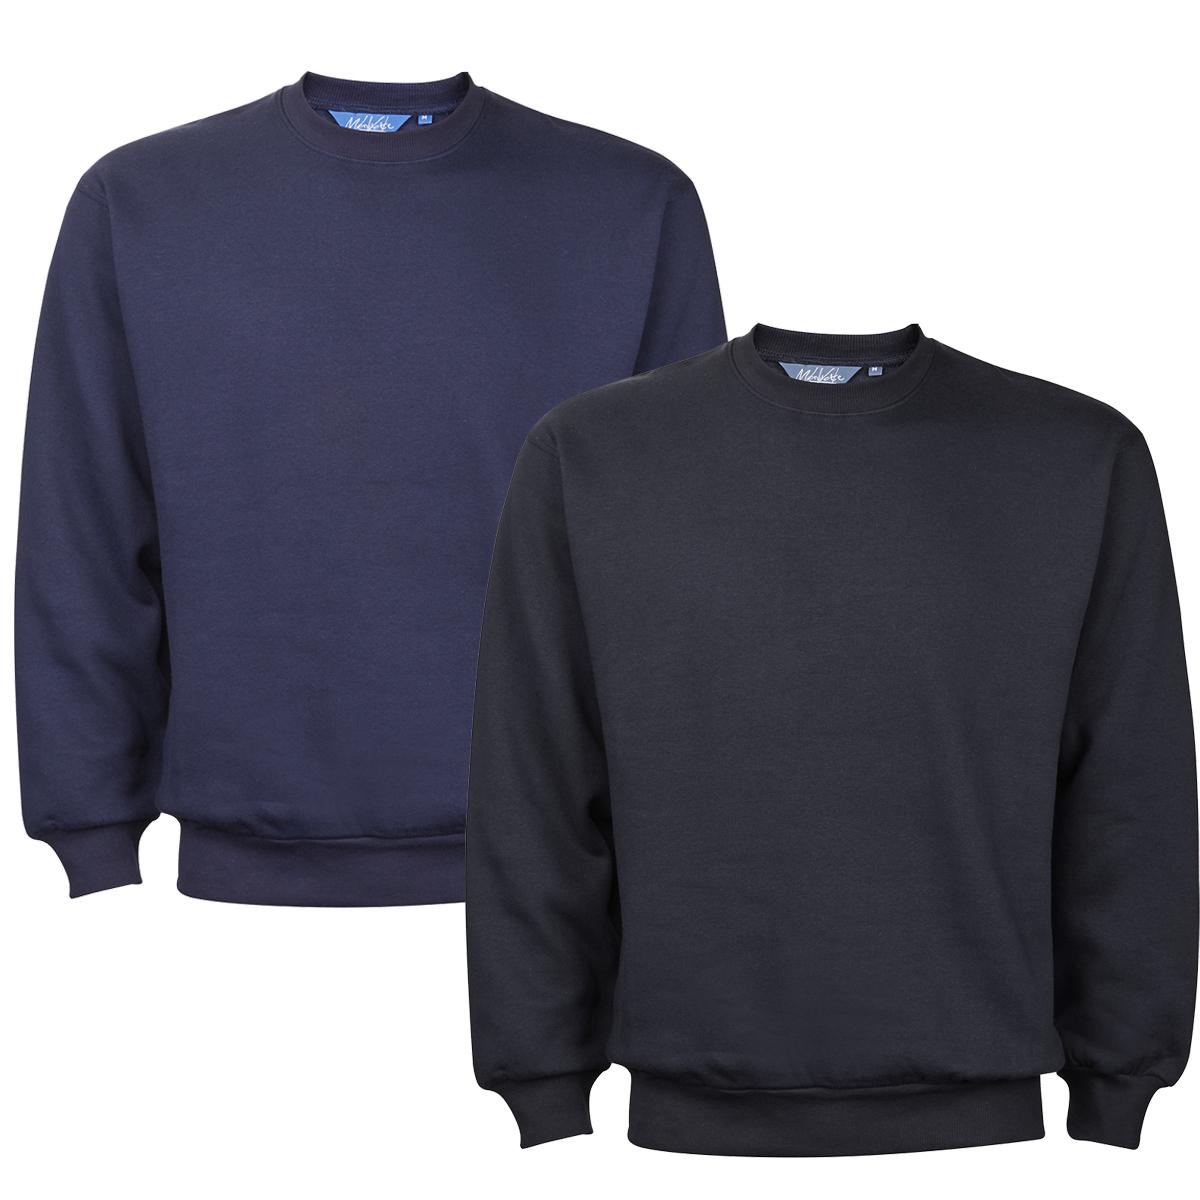 Mens-New-Plain-Crew-Neck-Sweatshirt-Jumper-Top-Pullover-Sweater-Long-Sleeve thumbnail 8